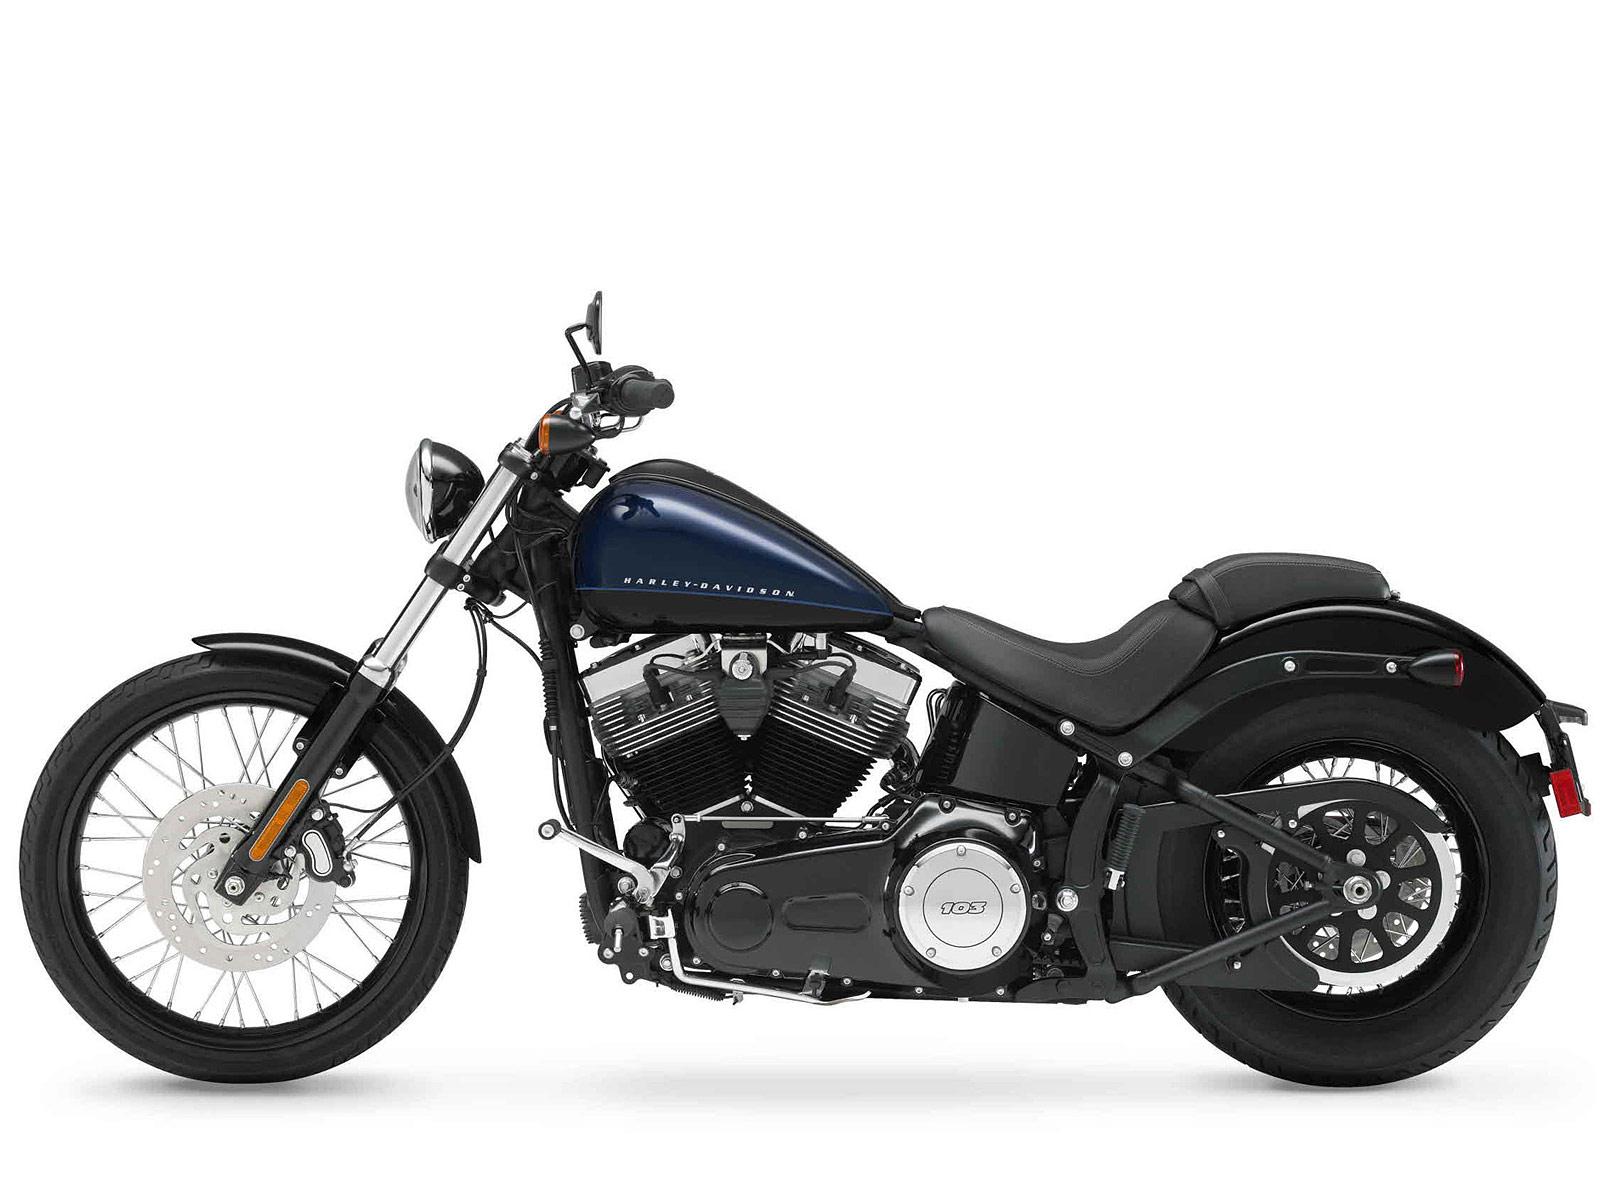 Harley Softail Frame Diagram 220 Volt Wiring Diagrams 2012 Harleydavidson Fxs Blackline Insurance